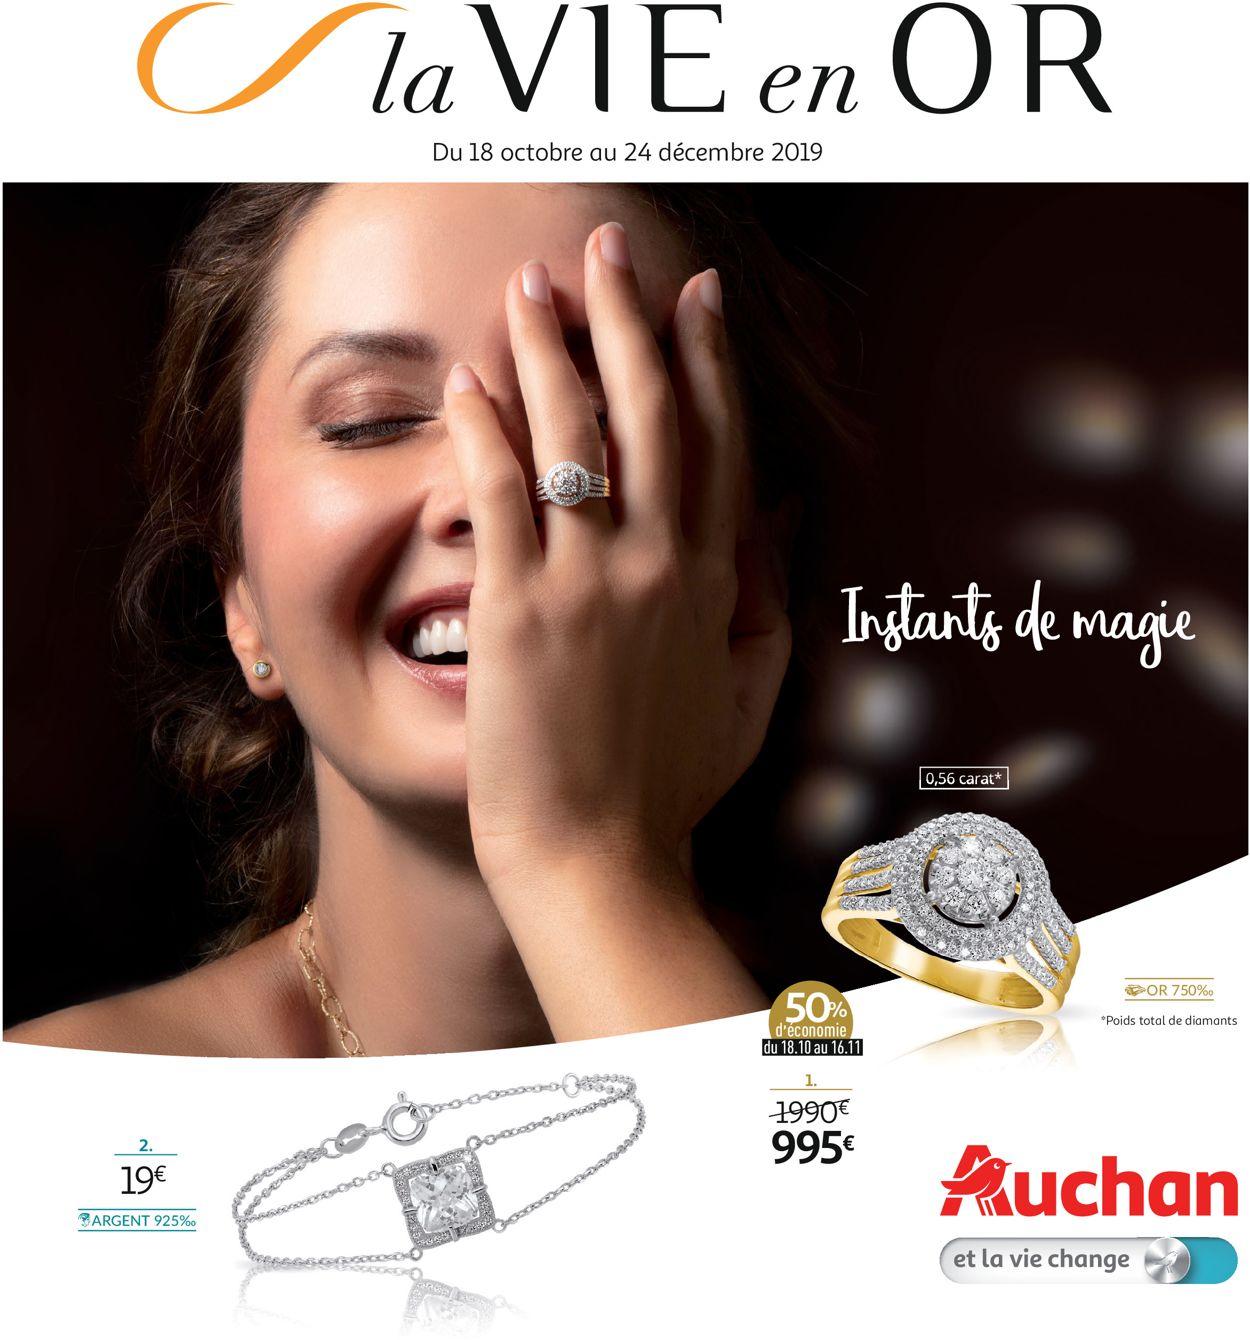 Auchan Catalogue - 18.10-24.12.2019